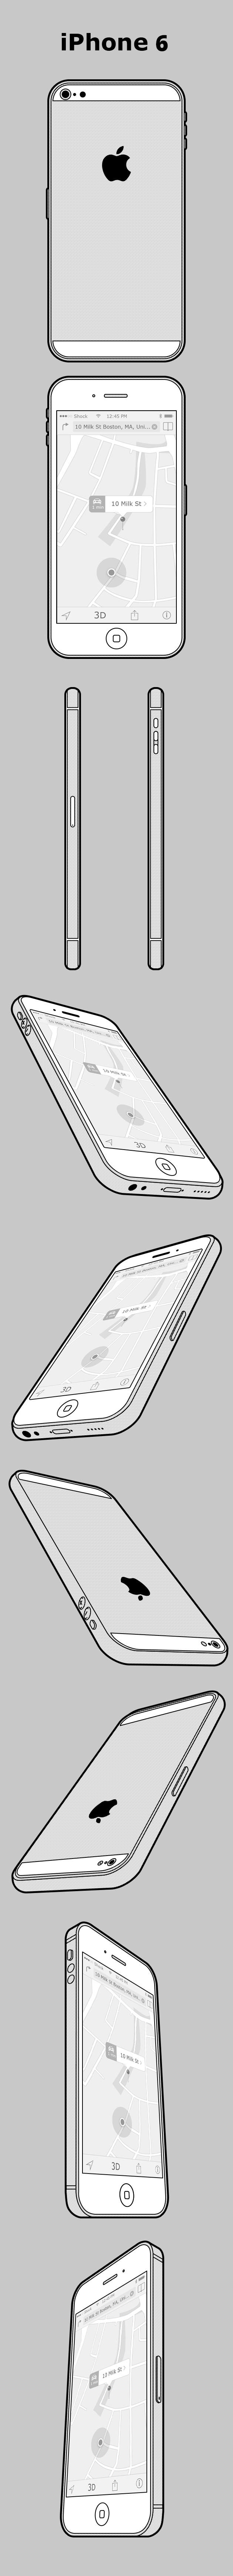 line_iphone_mockup_03